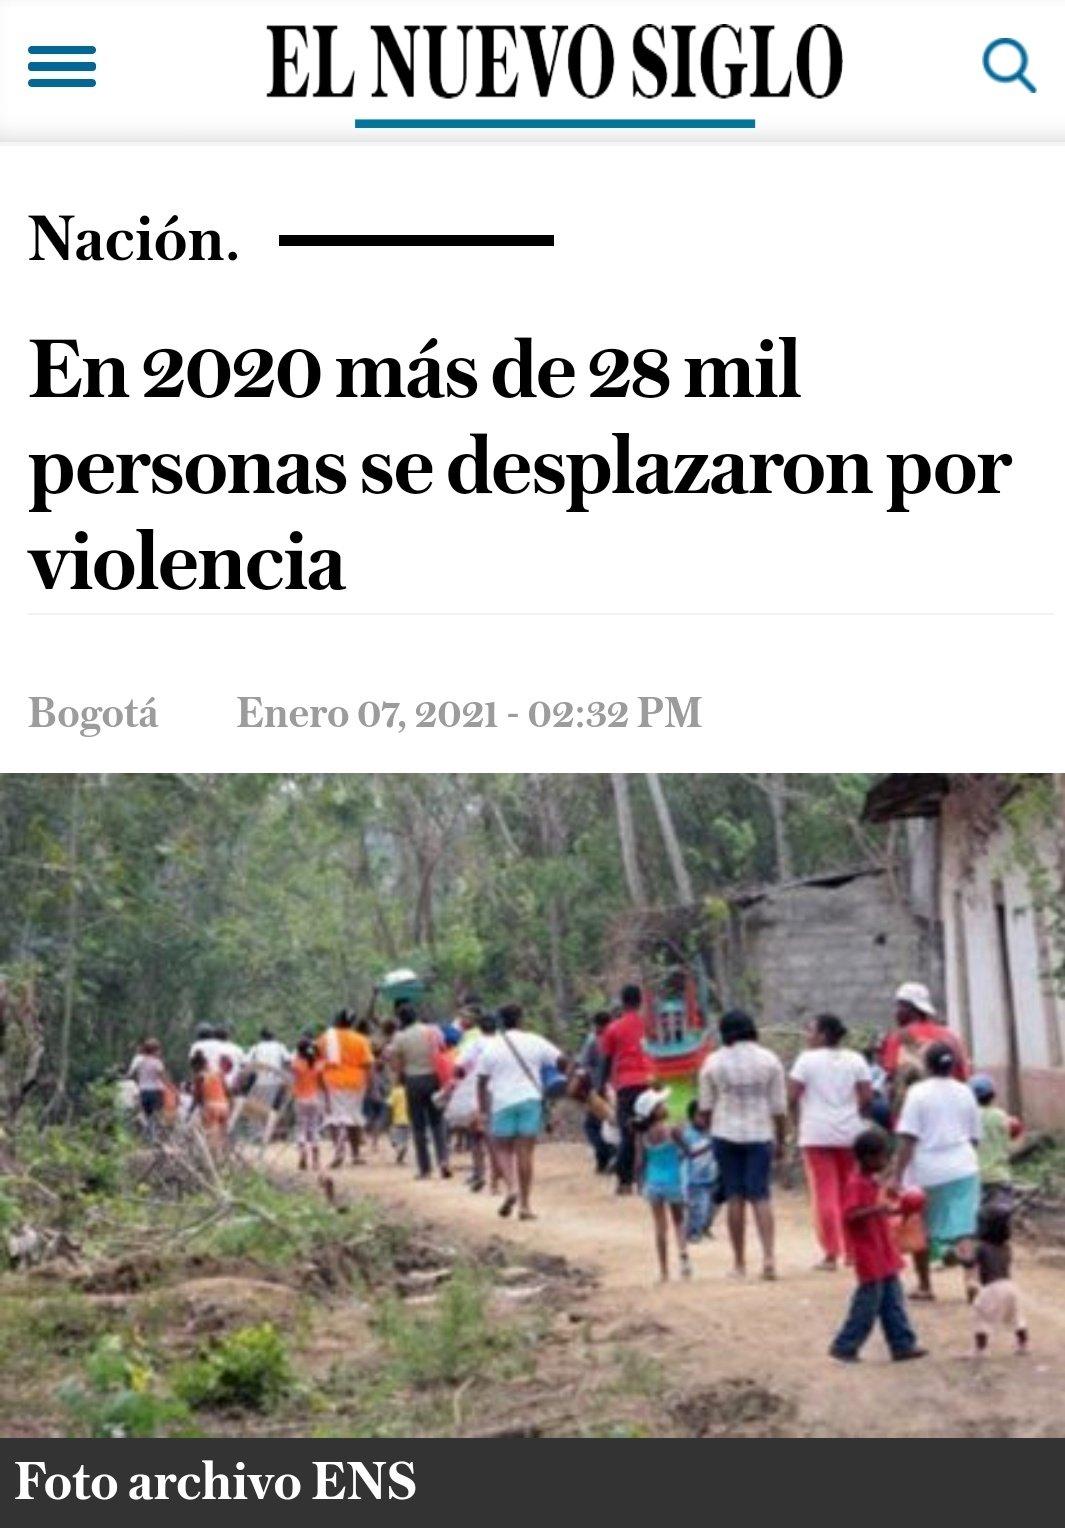 Tag colombia en El Foro Militar de Venezuela  ErN6xTqW8AMelOd?format=jpg&name=large